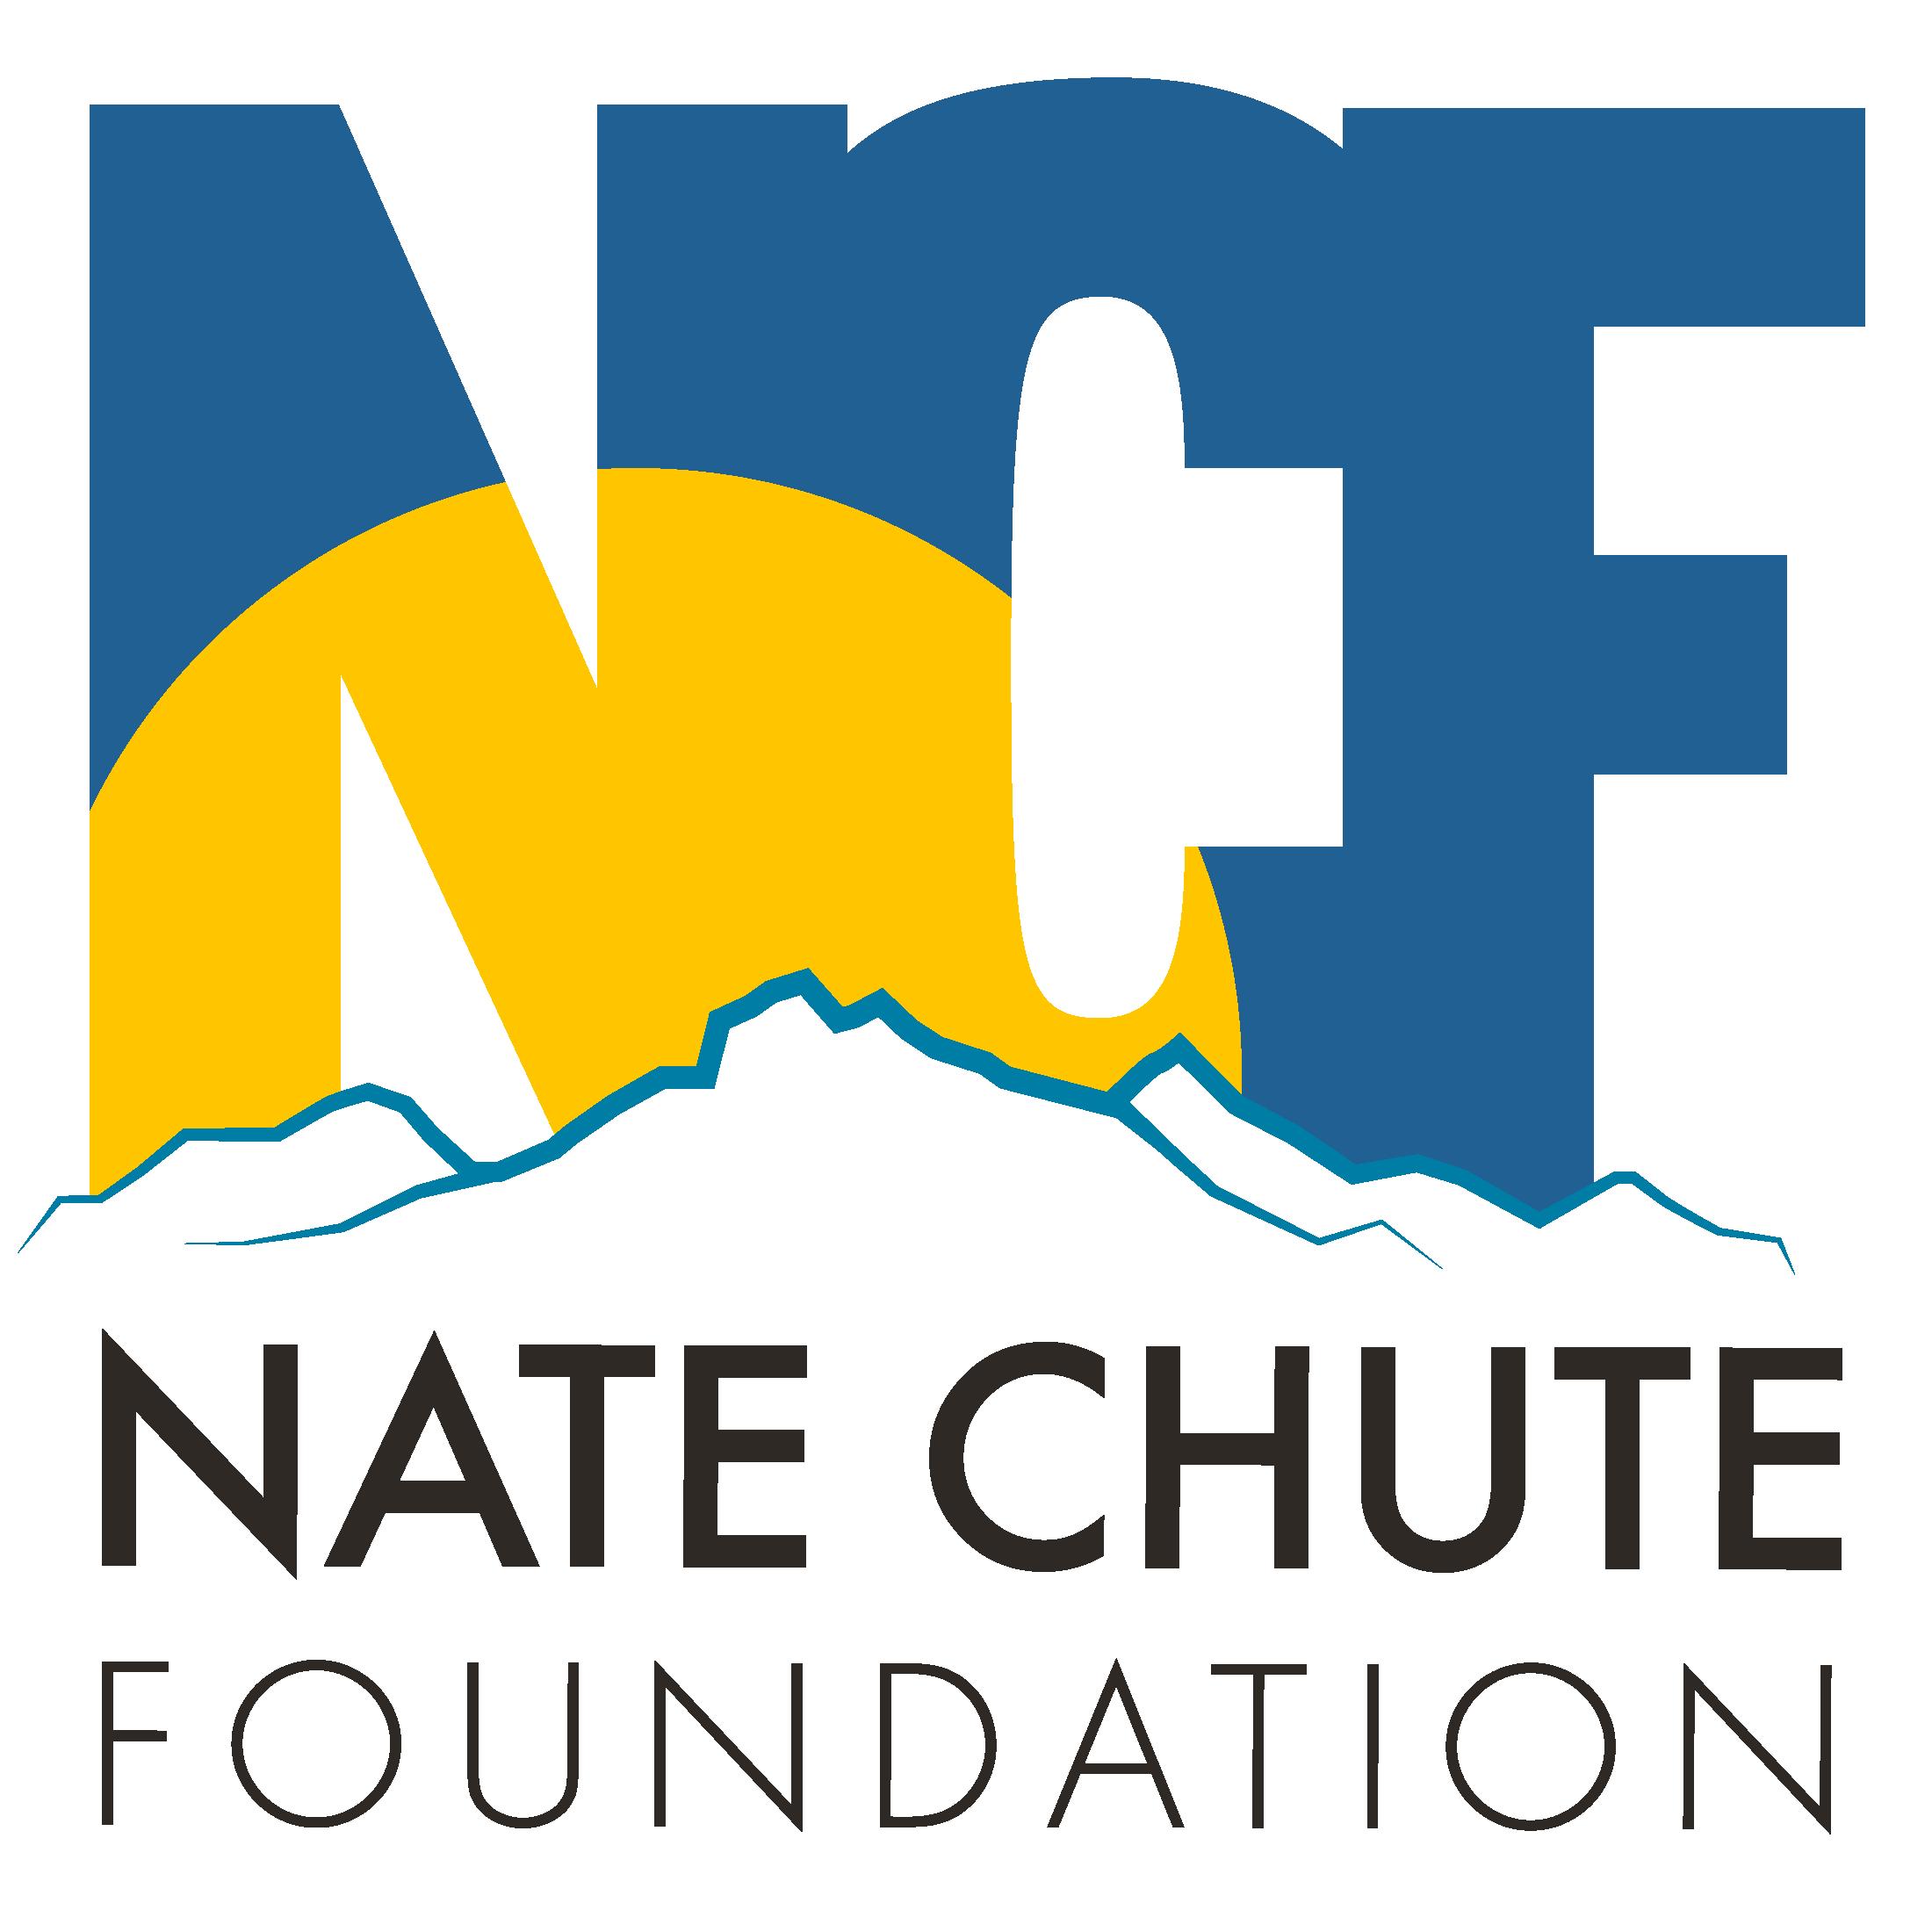 Nate Chute Foundation